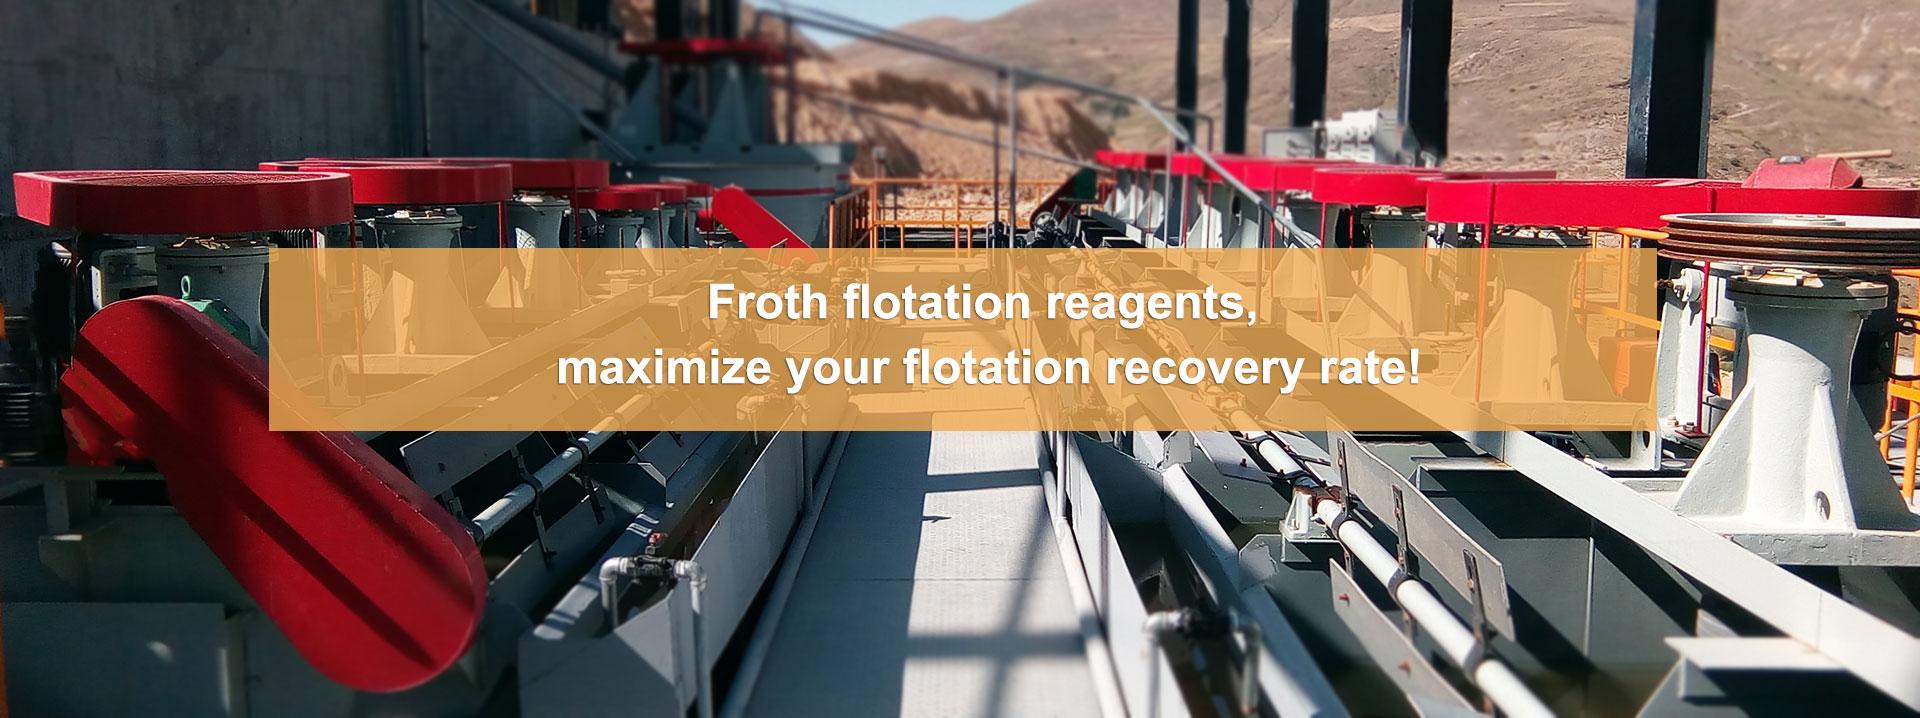 flotation reagent